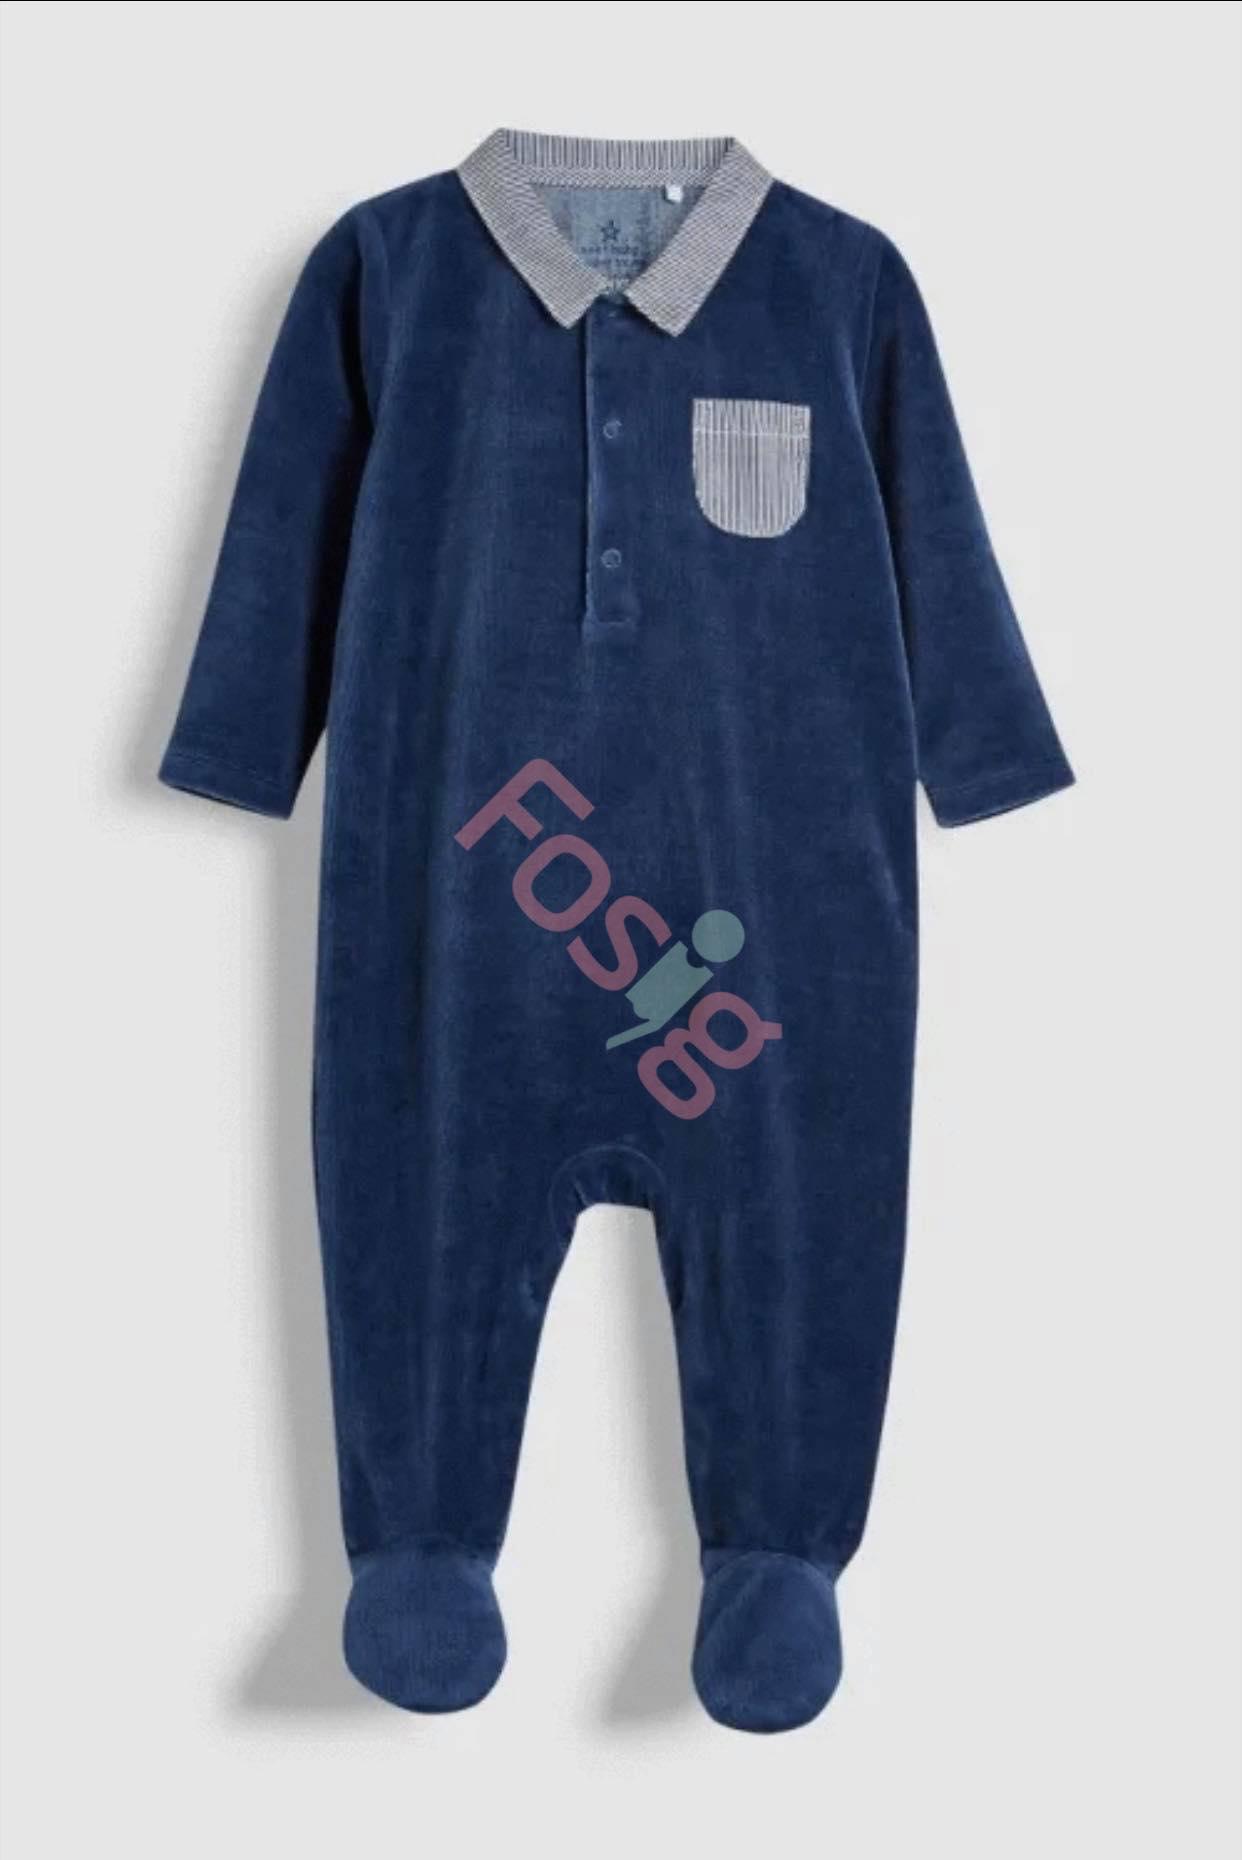 [3-14kg] Sleepsuit Next Baby 73 [Boy] - Xanh Navy/Nhung